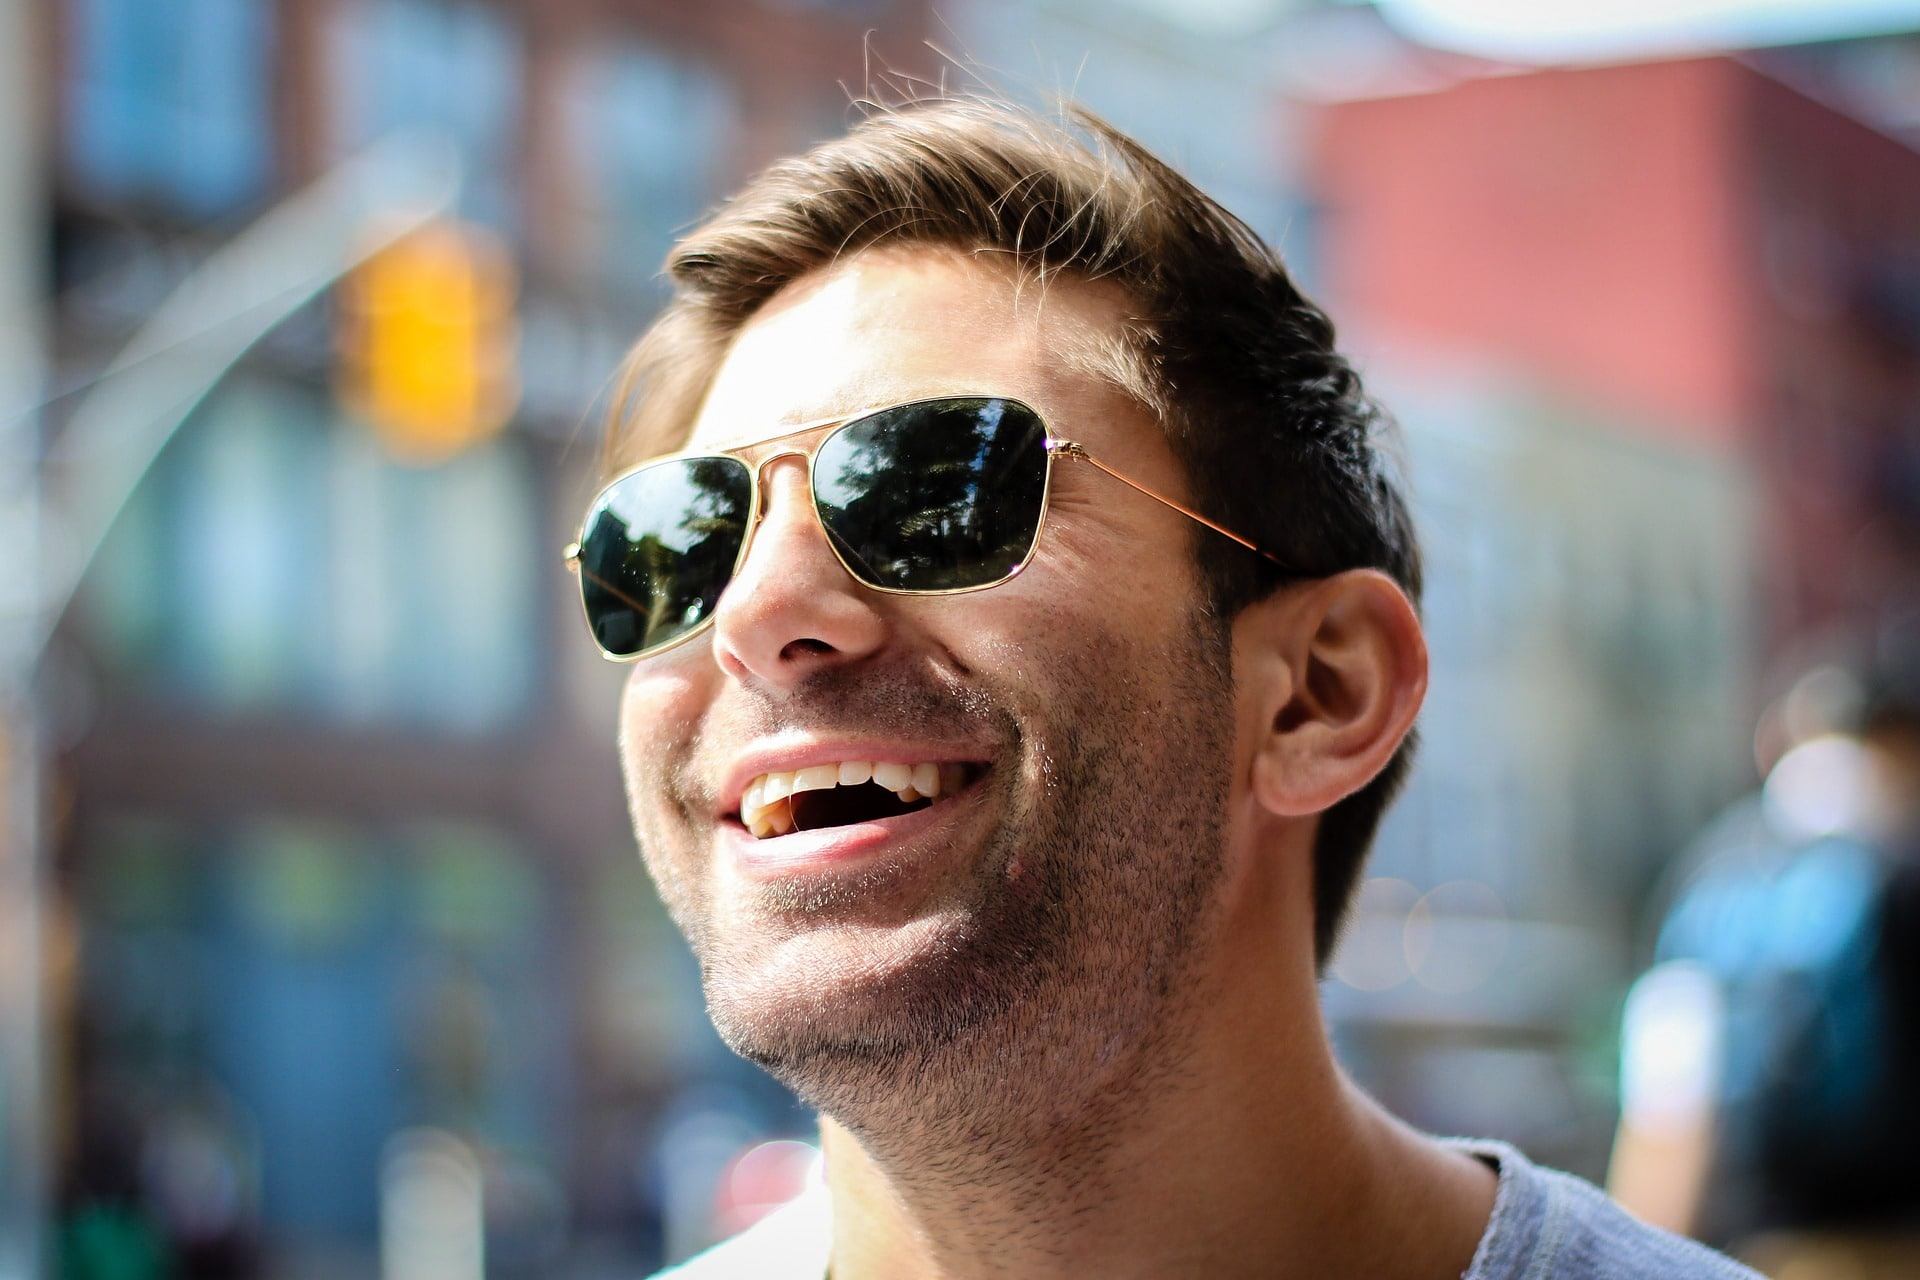 holistic dentist in Prescott - man with sunglasses